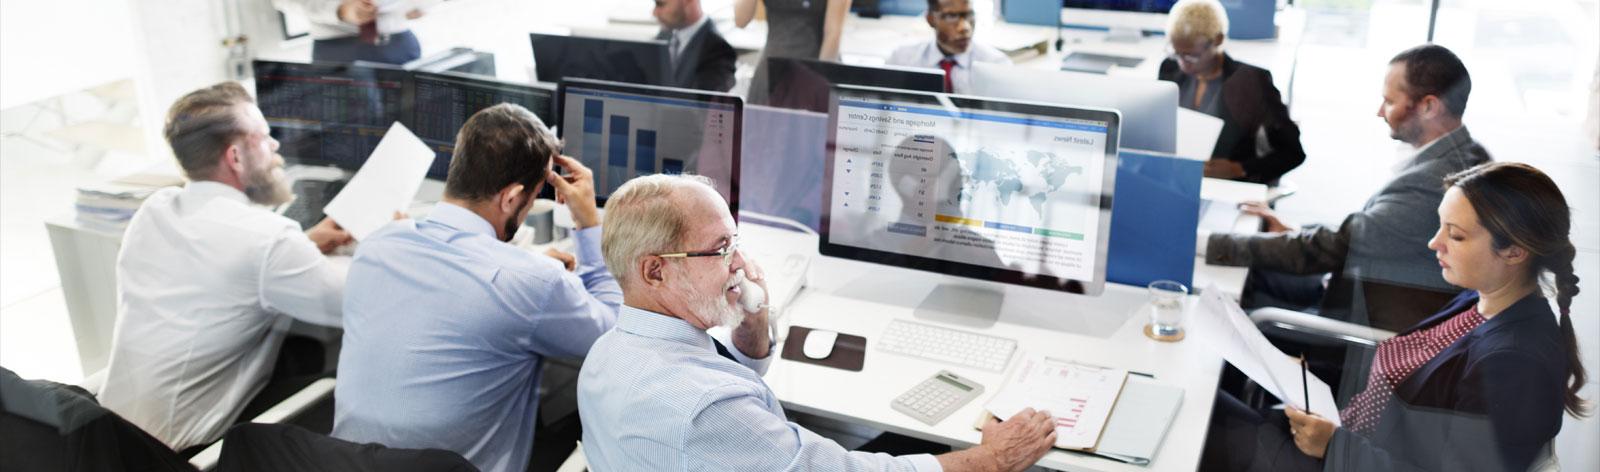 Virtual Bond Trading Assistant